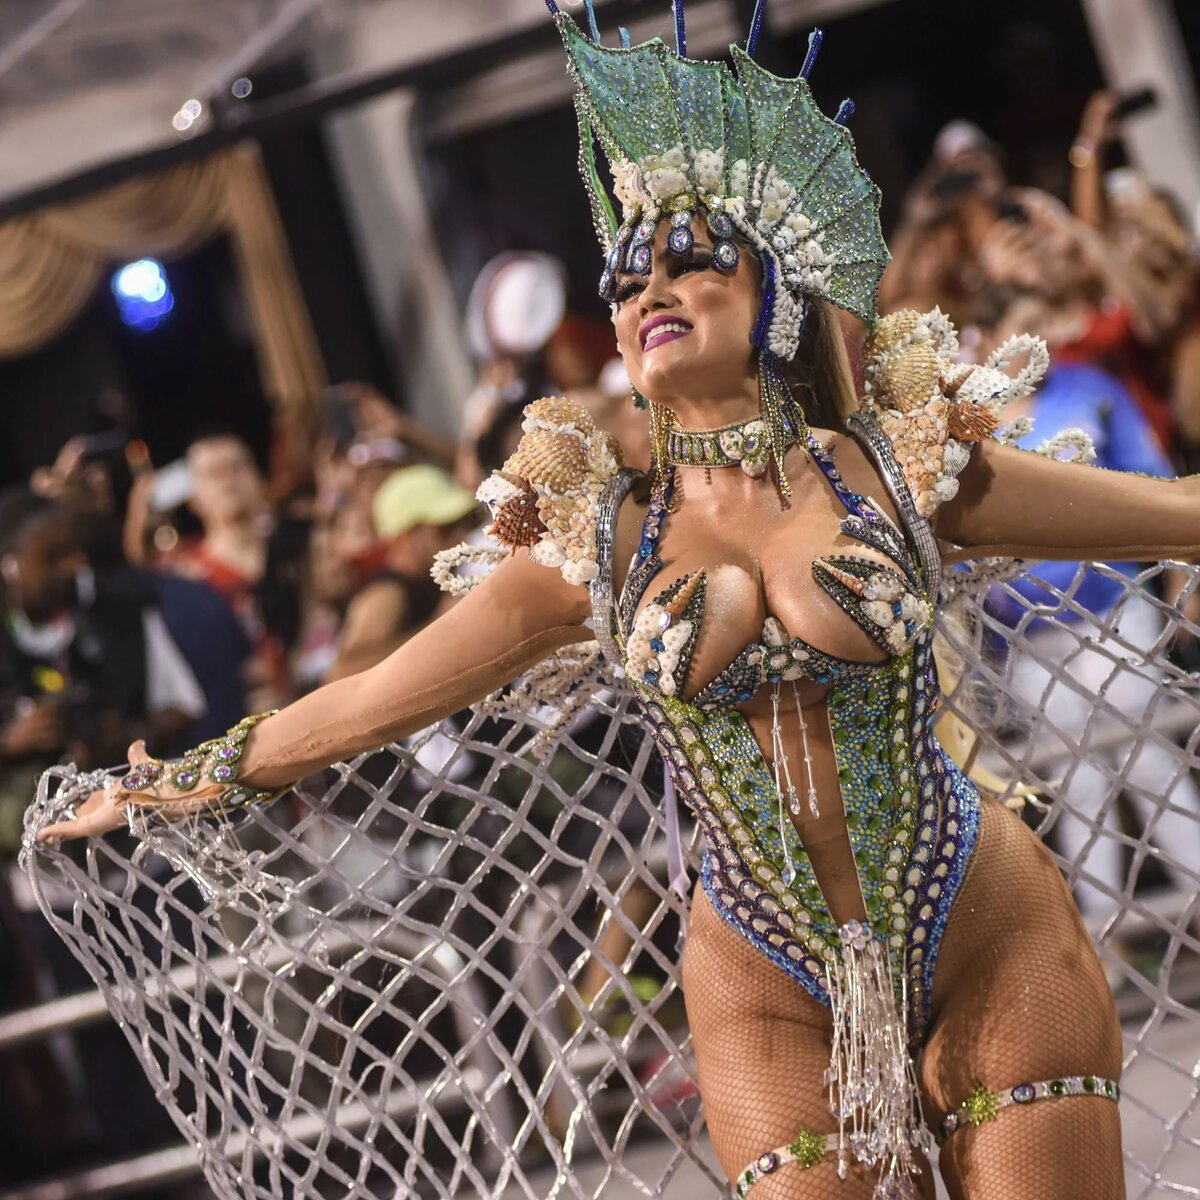 карнавал в рио фото танцовщиц тем дхармендра заверил